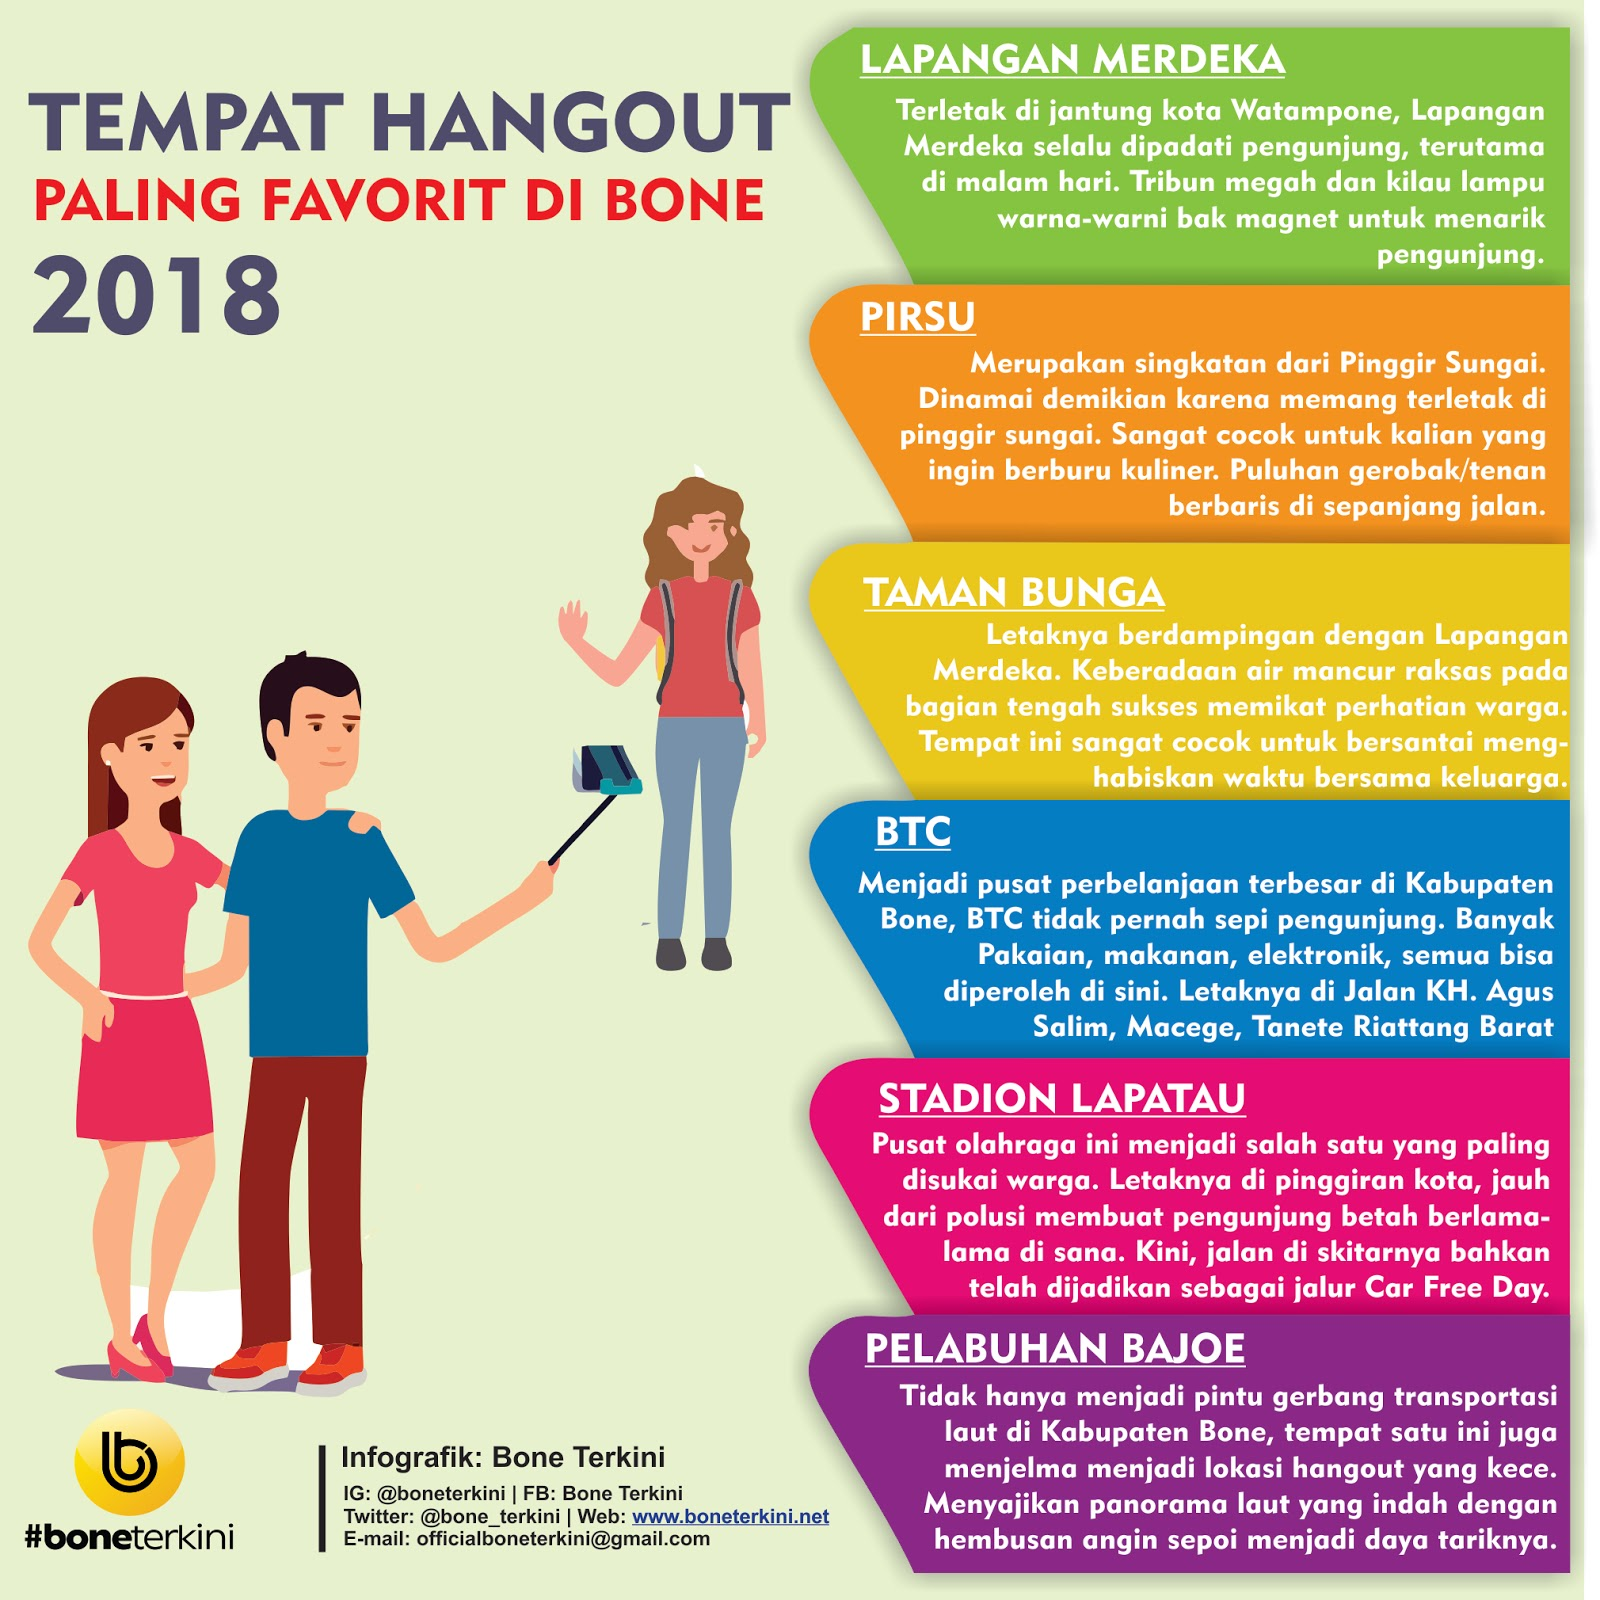 6 Tempat Nongkrong dan Hangout Paling Favorit di Bone 2018, Yuk Jalan-jalan ke Sini!